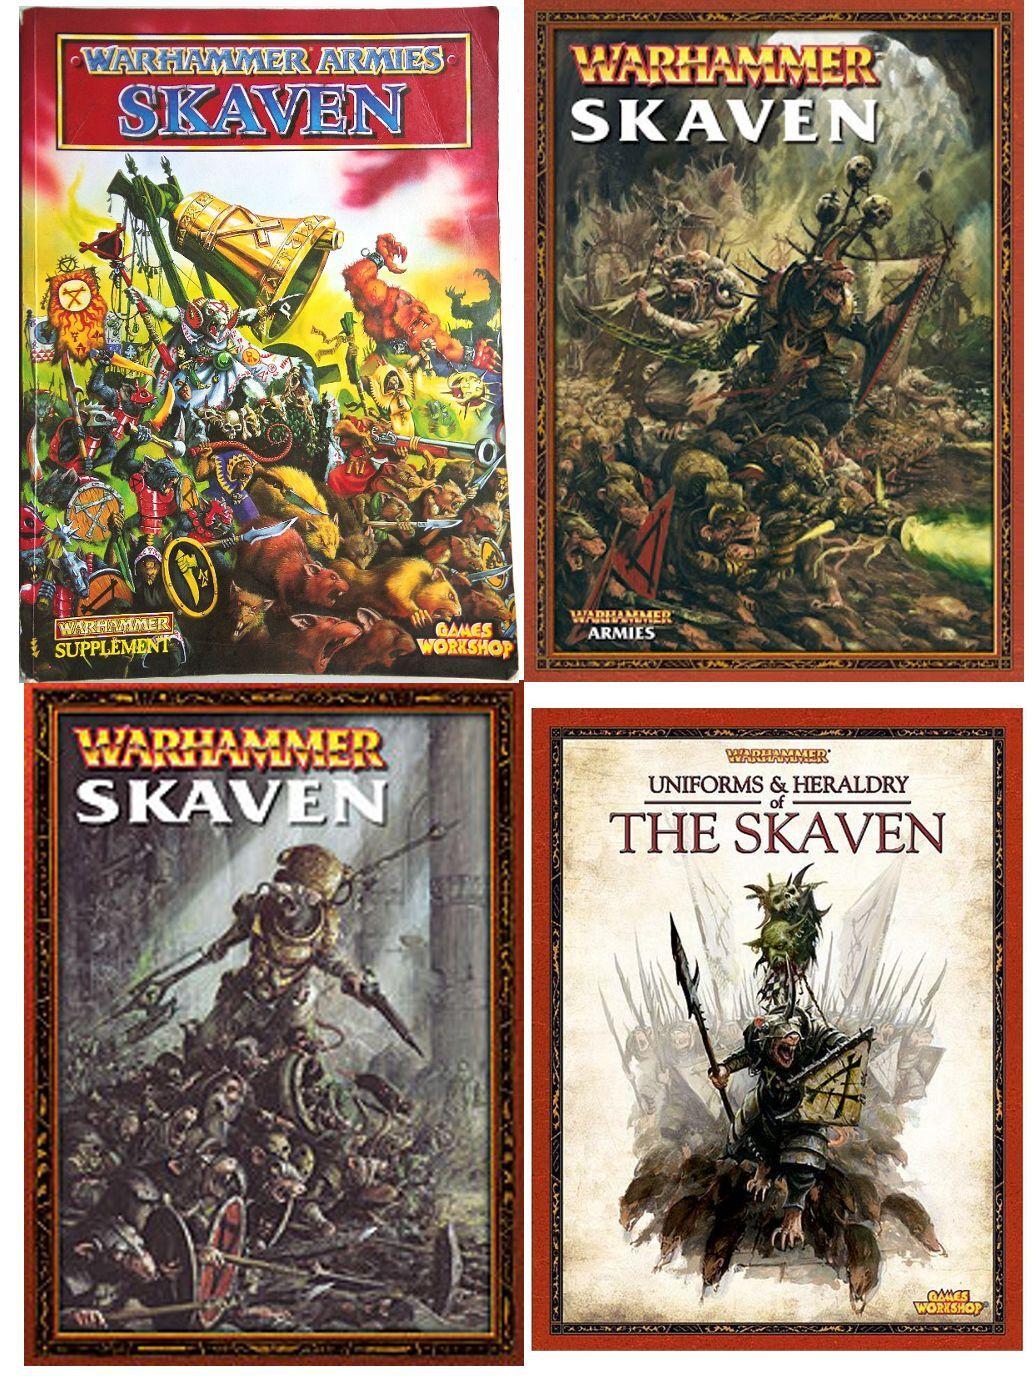 Skaven Warhammer Army Book various editions select - OOP